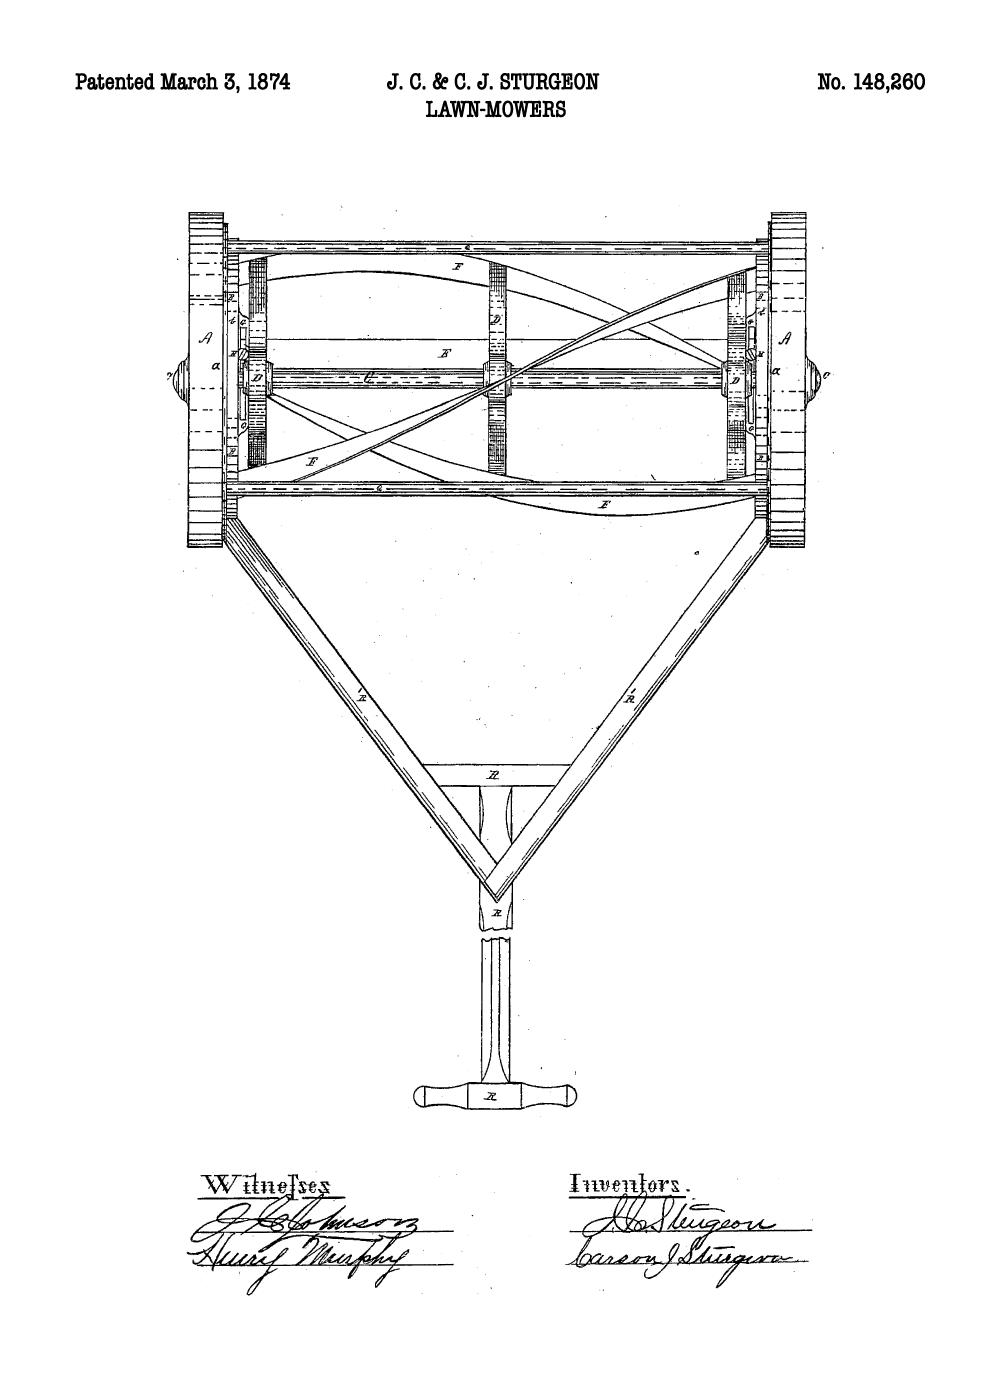 Plæneklipper plakat - Original patent tegning